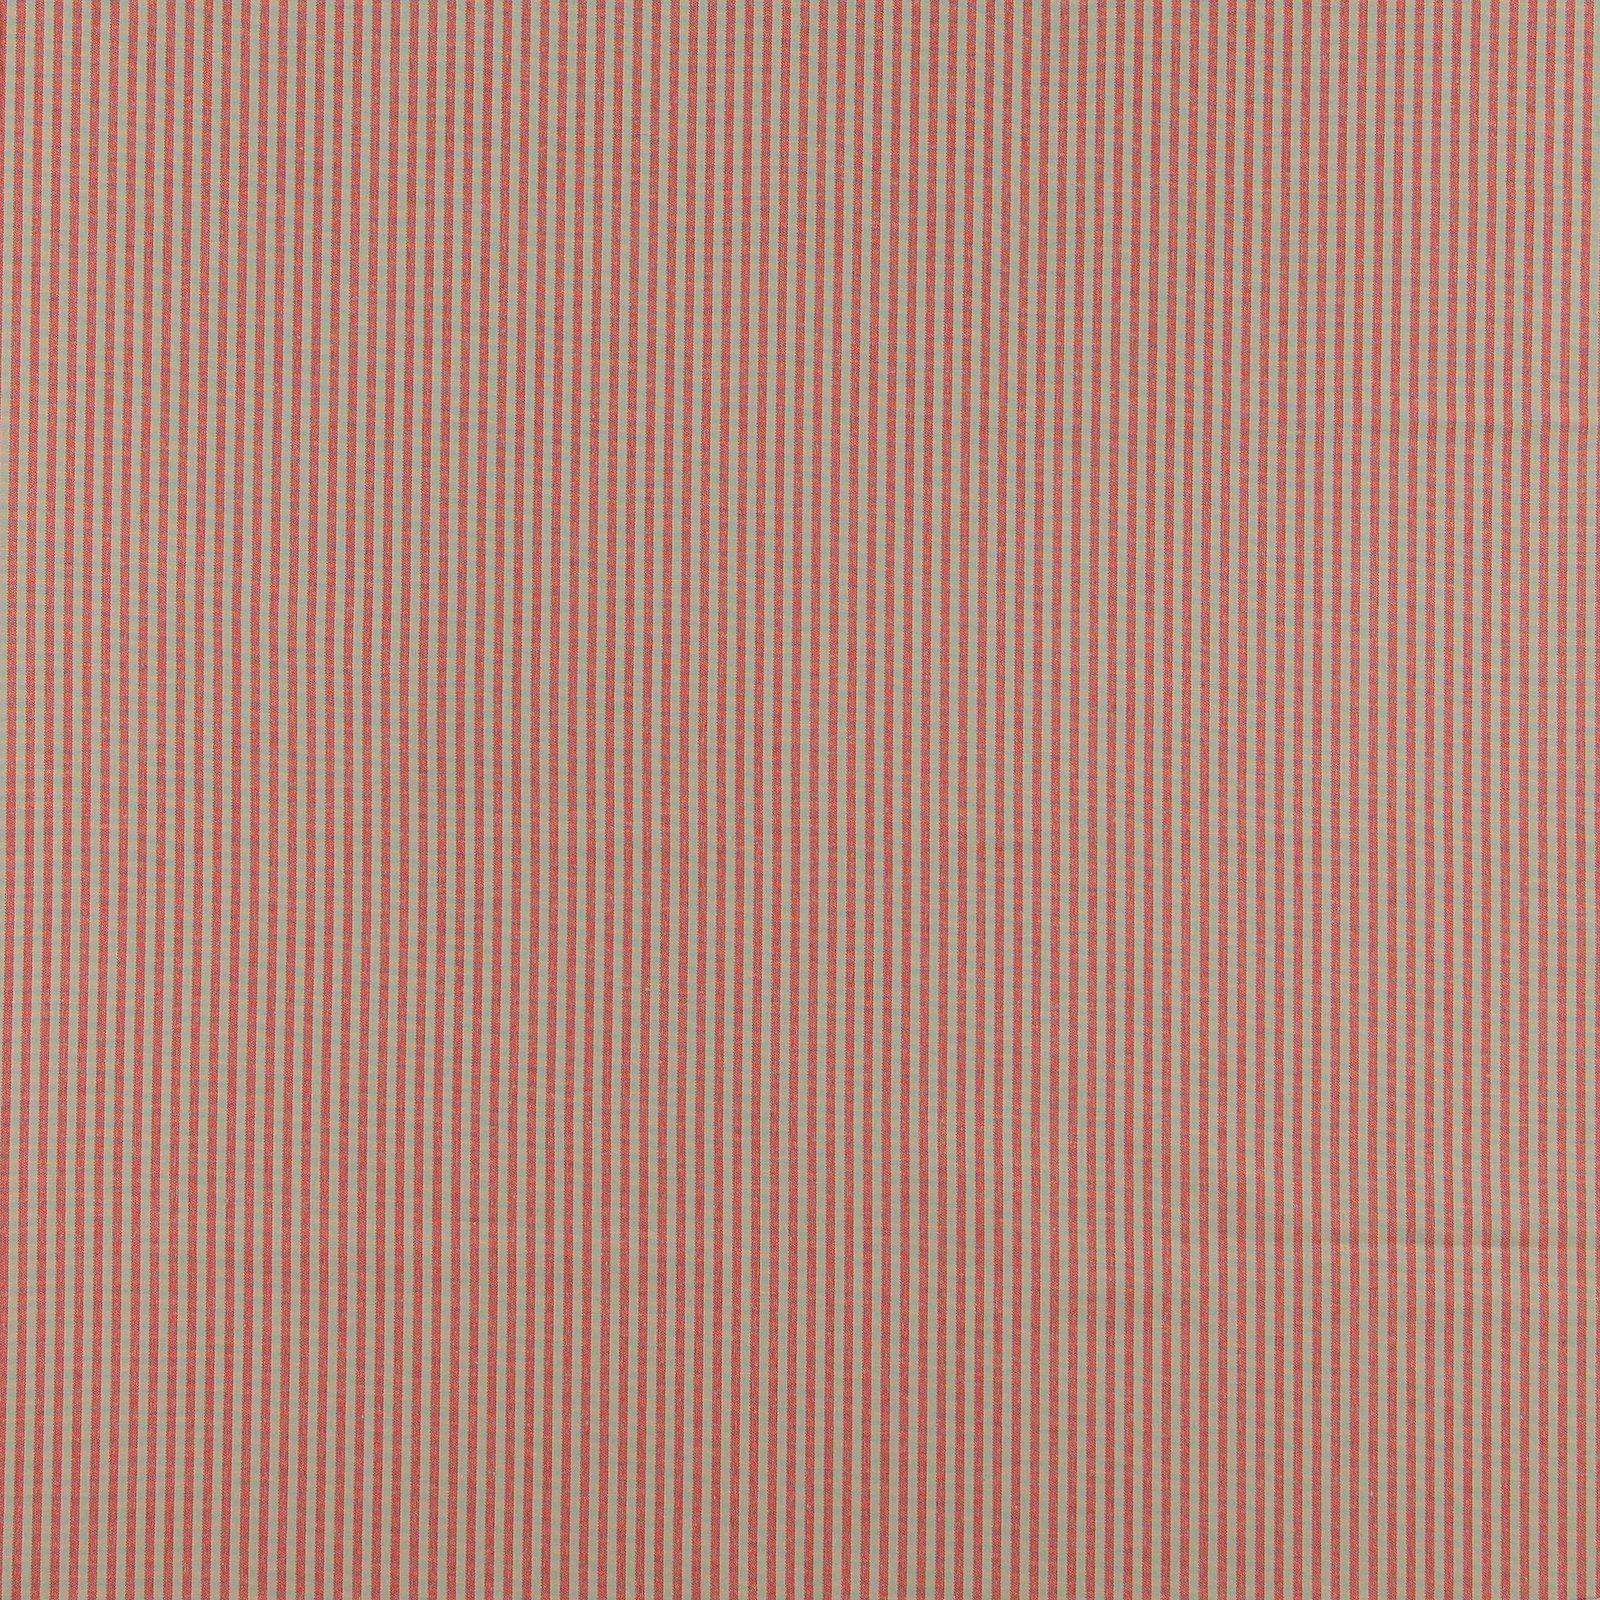 Yarn dyed red/sand narrow stripe